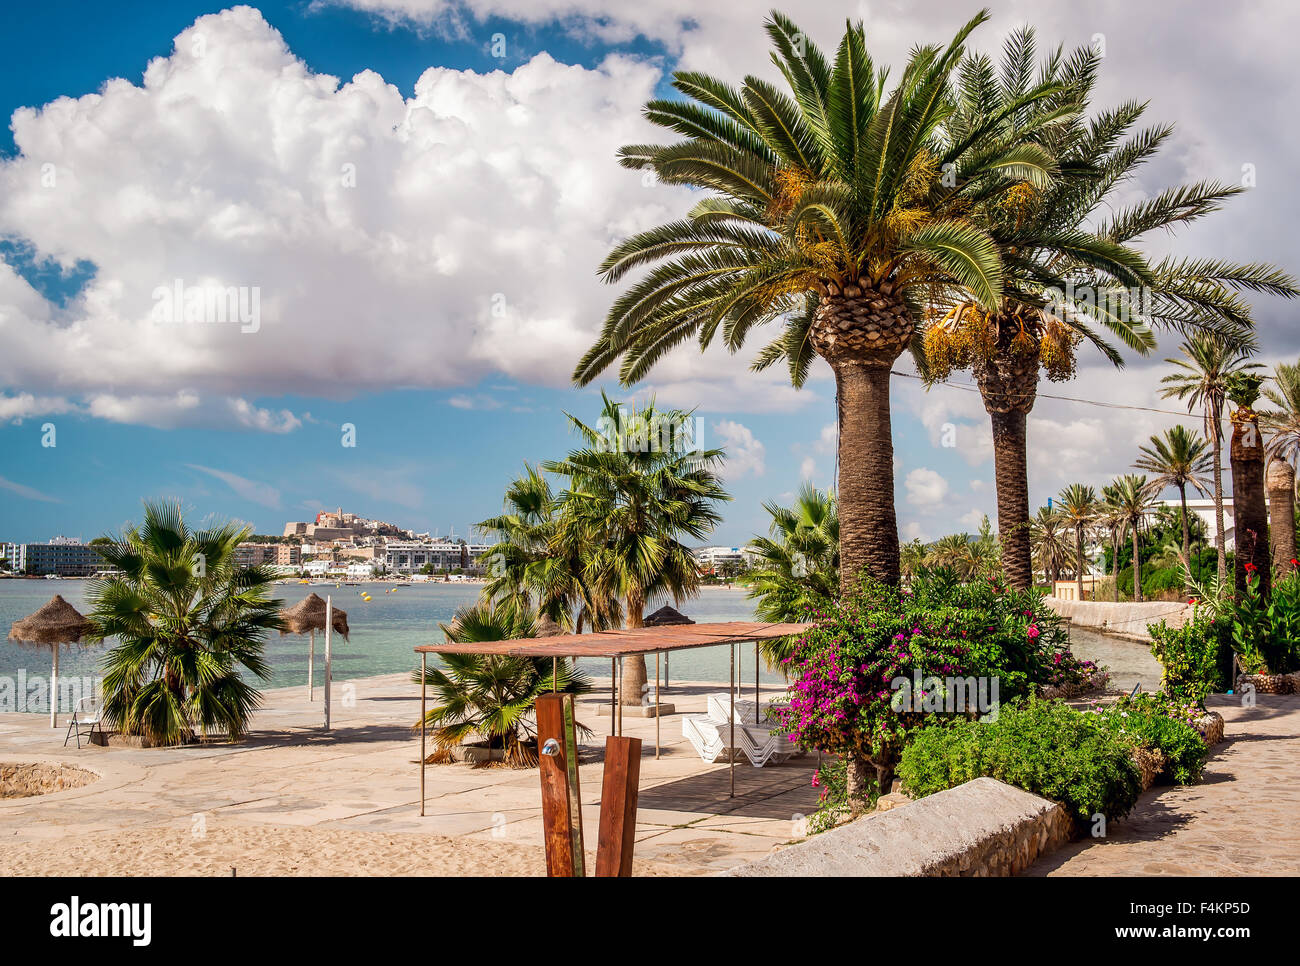 Promenade du front de mer d'Ibiza. Îles Baléares. Espagne Photo Stock